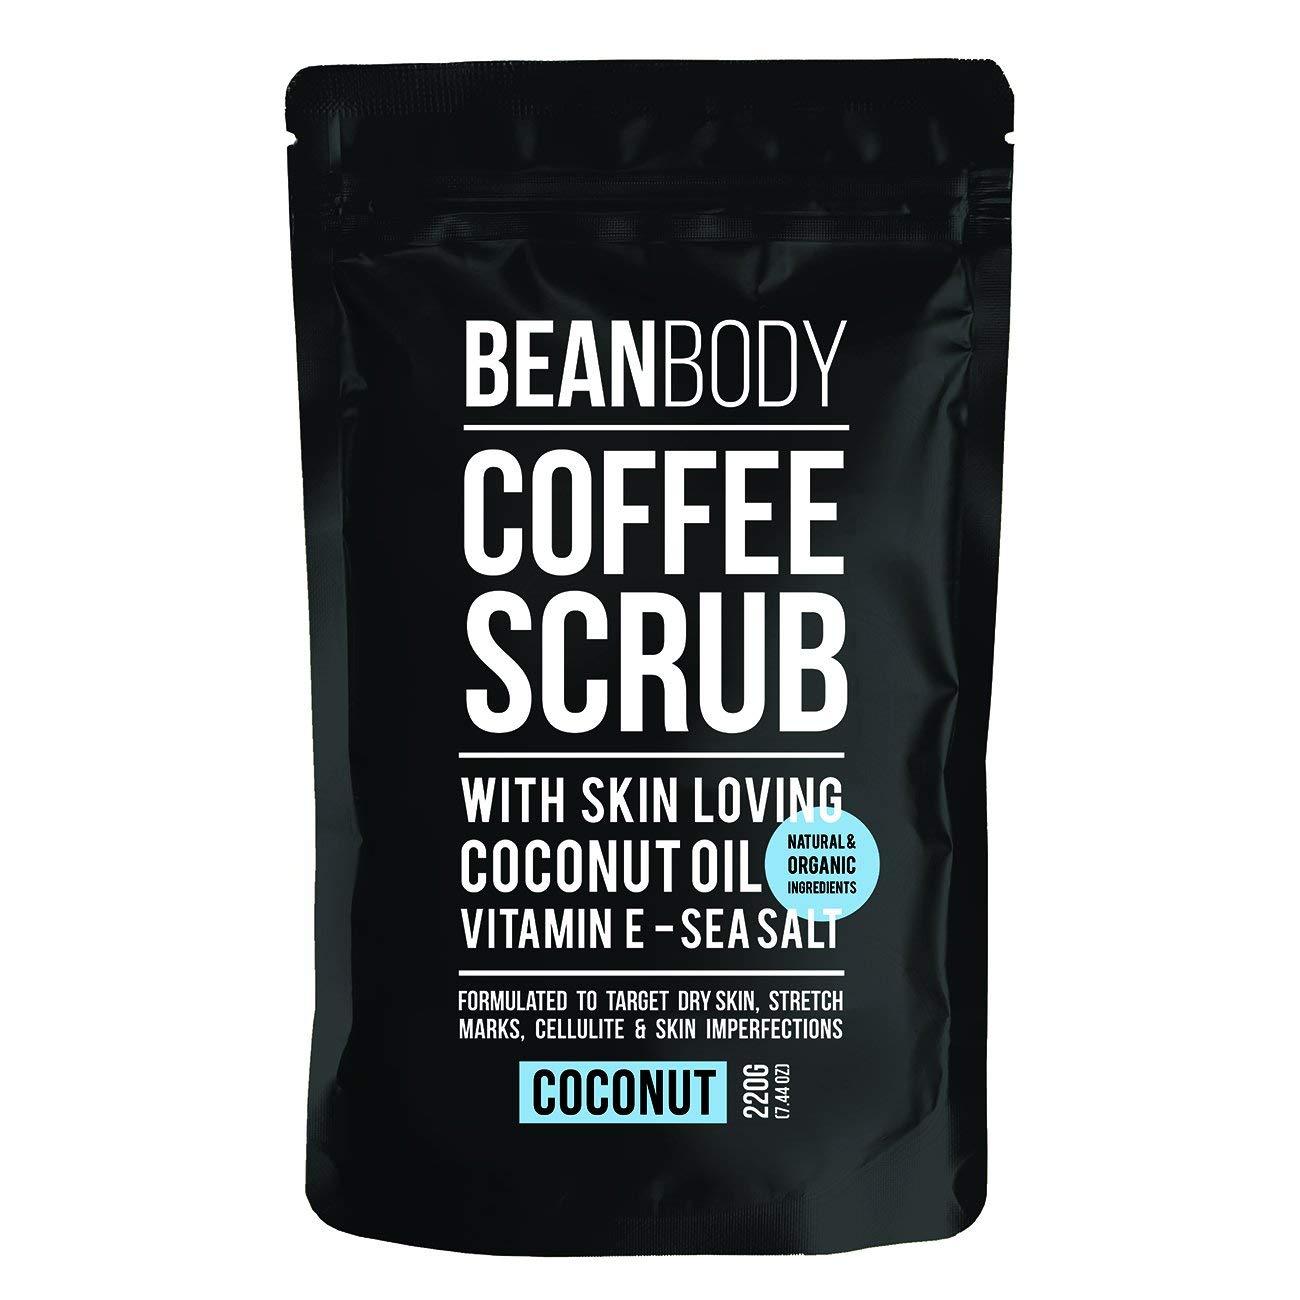 Mr. Bean Organic All Natural Coffee Bean Exfoliating Body Skin Scrub with Coconut Oil, Vitamin E, an